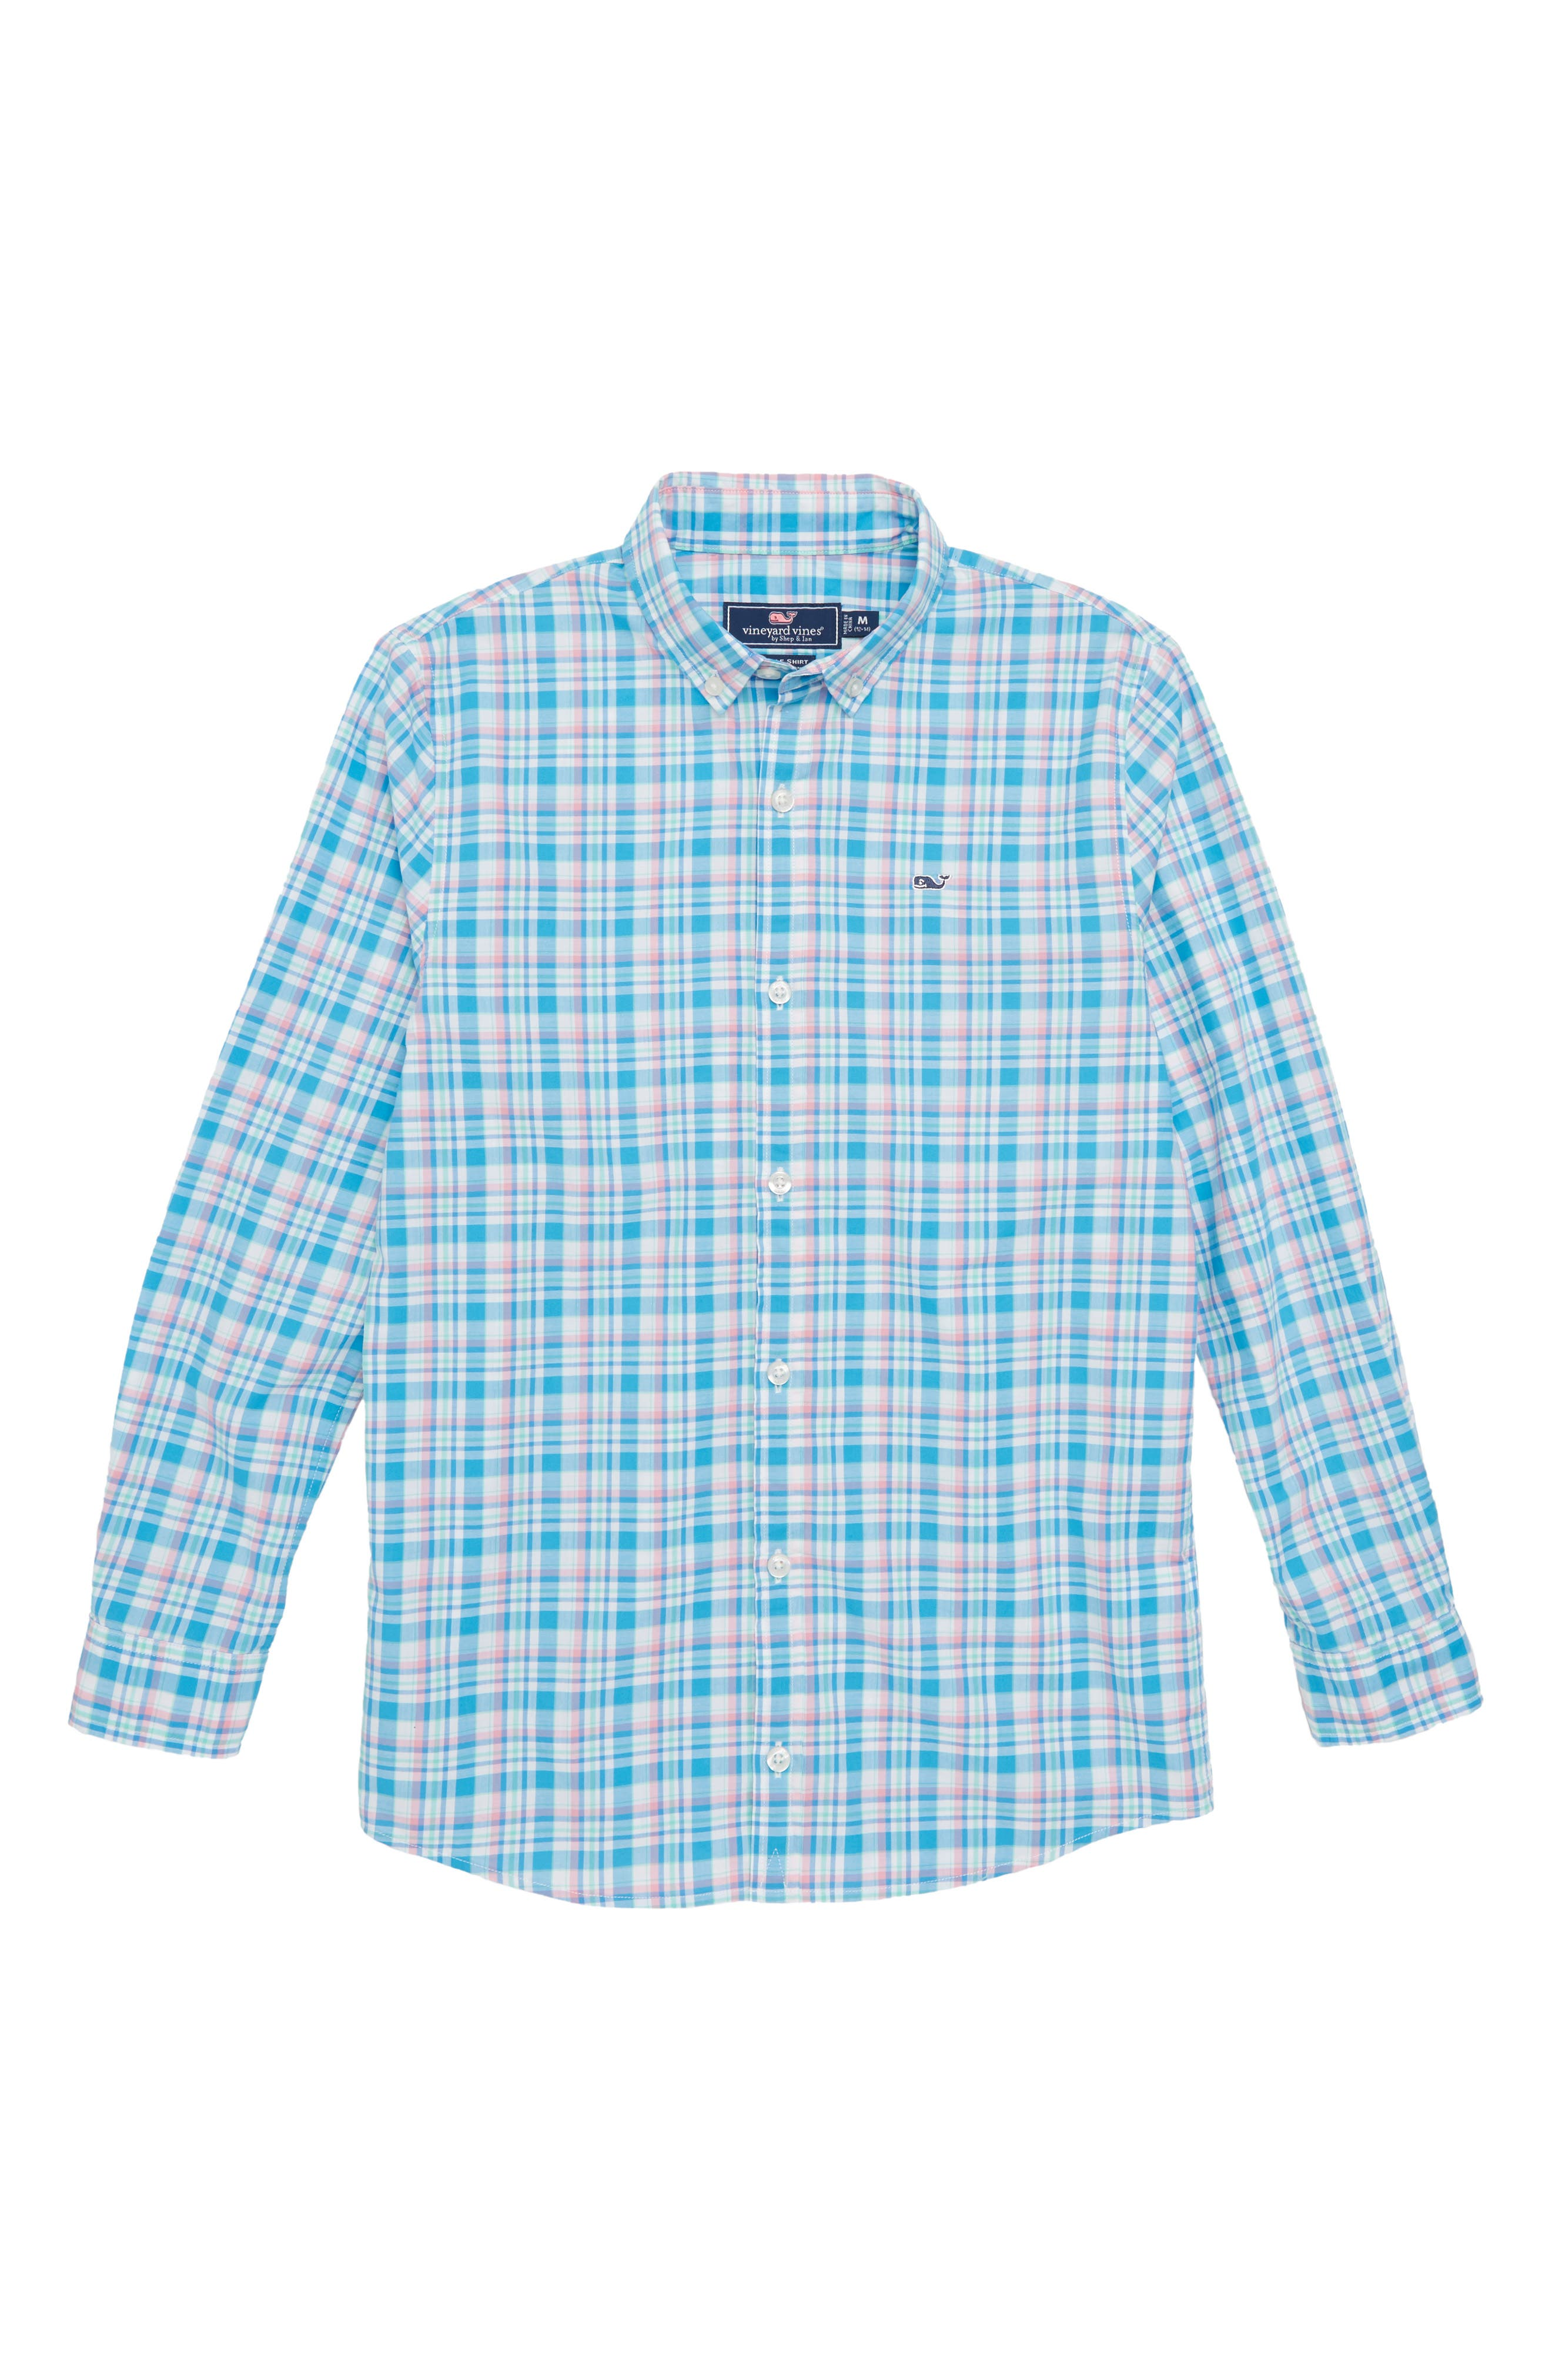 Pinmy's Point Plaid Whale Shirt,                         Main,                         color, KEEL BLUE